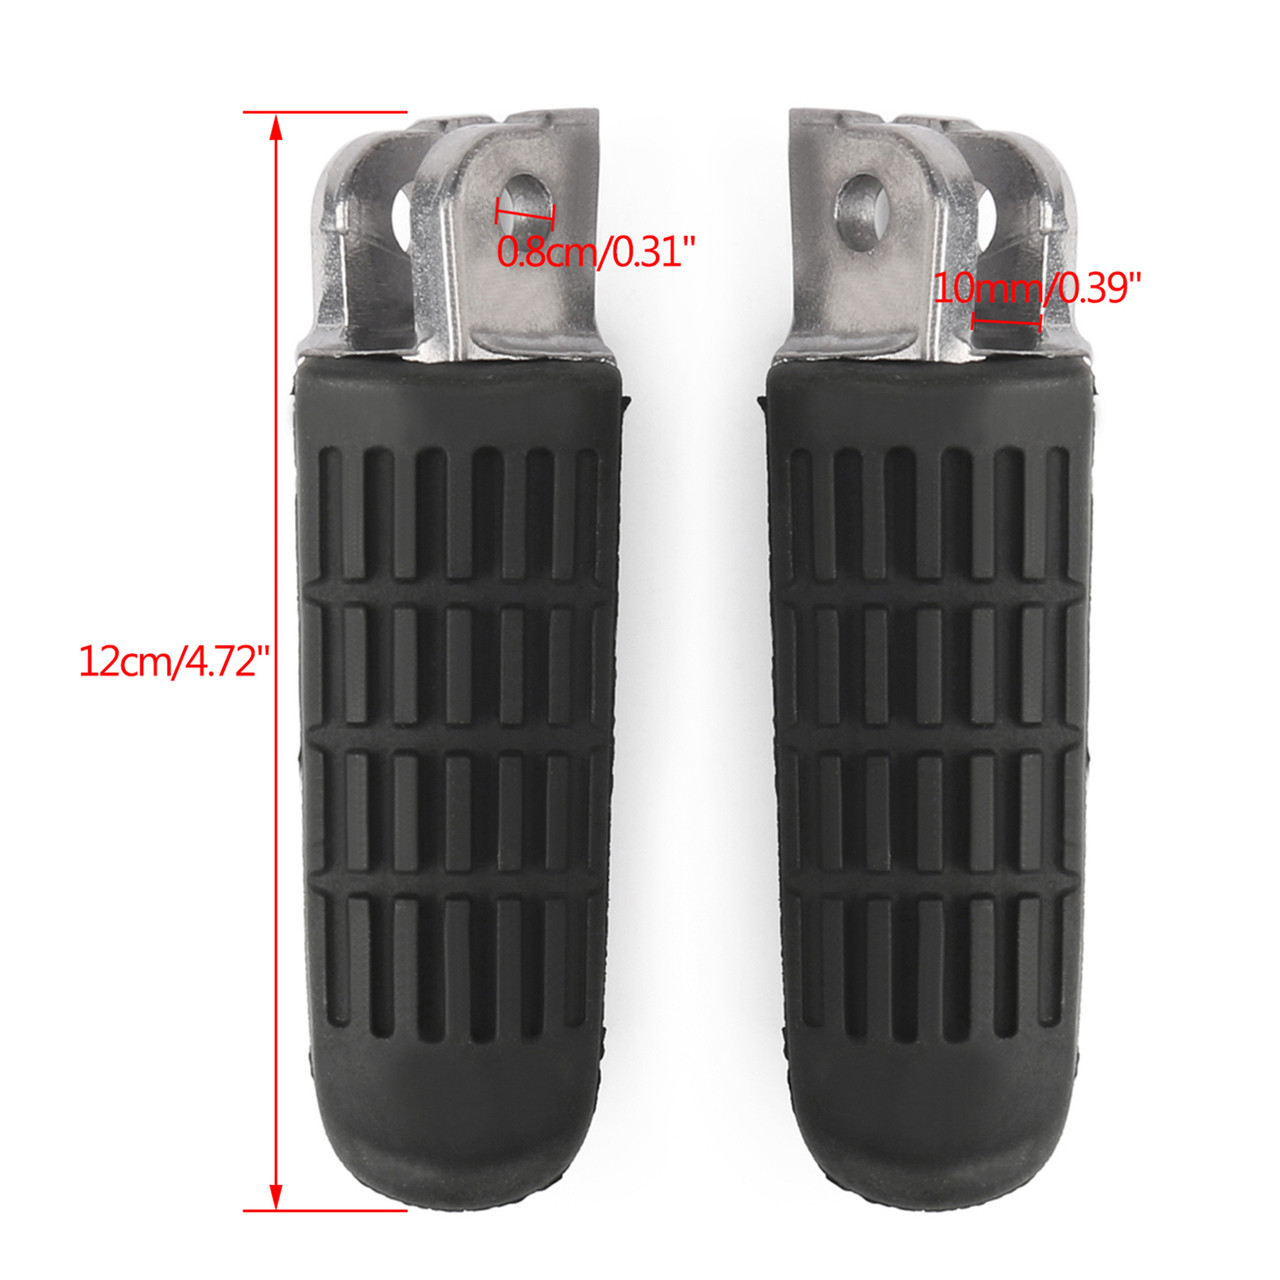 Front Footrest Foot Pegs For Honda VT250 Spada MC20 (88-90) VTR250 MC33 (97-09) CB-1 CB400F (89-91) CB400 CB400SF Superfour (92-98)